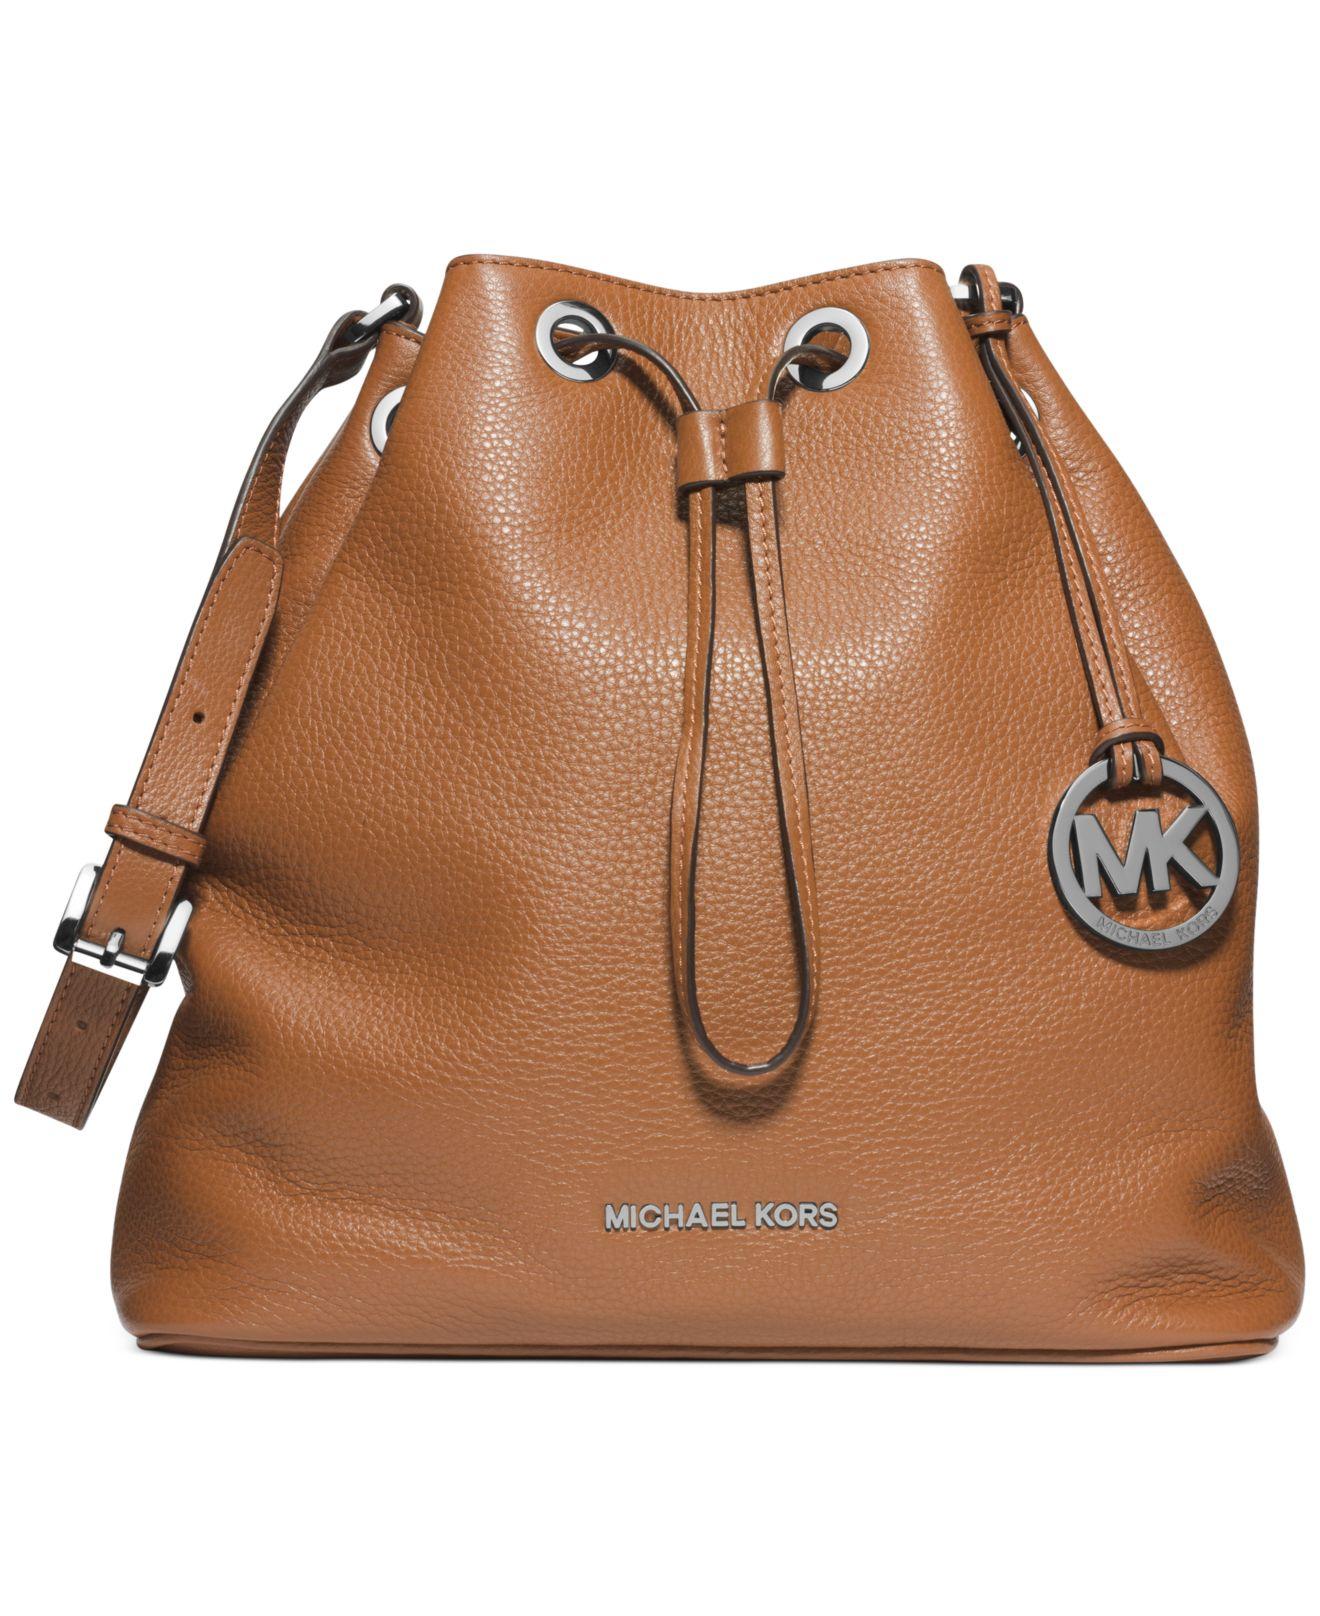 lyst michael kors michael jules large drawstring shoulder bag in brown rh lyst com